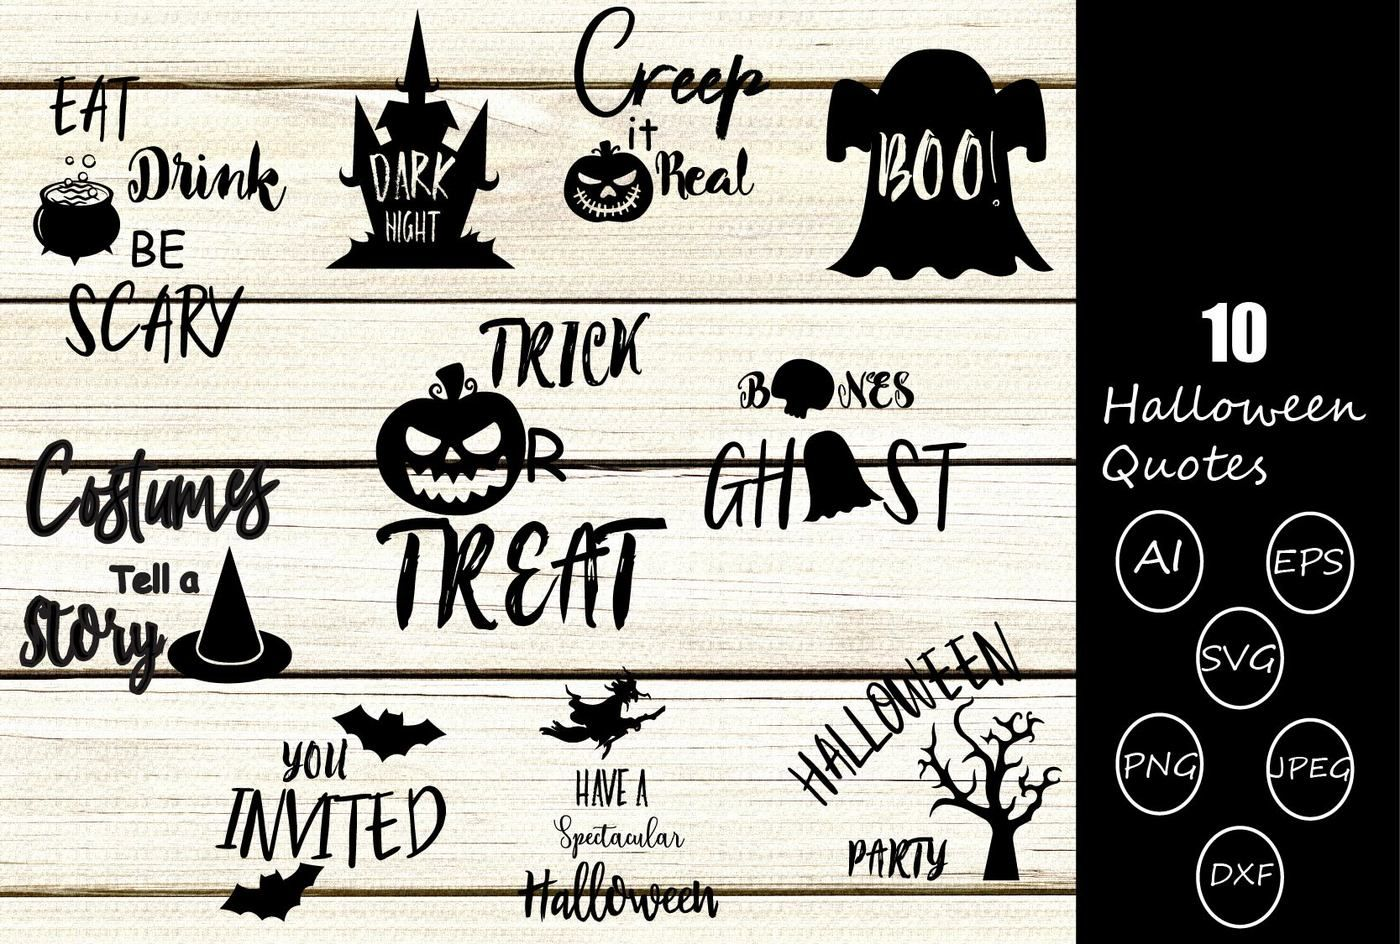 Halloween Quotes Svg.Halloween Quotes Svg Cutting Files By Yamini Thehungryjpeg Com